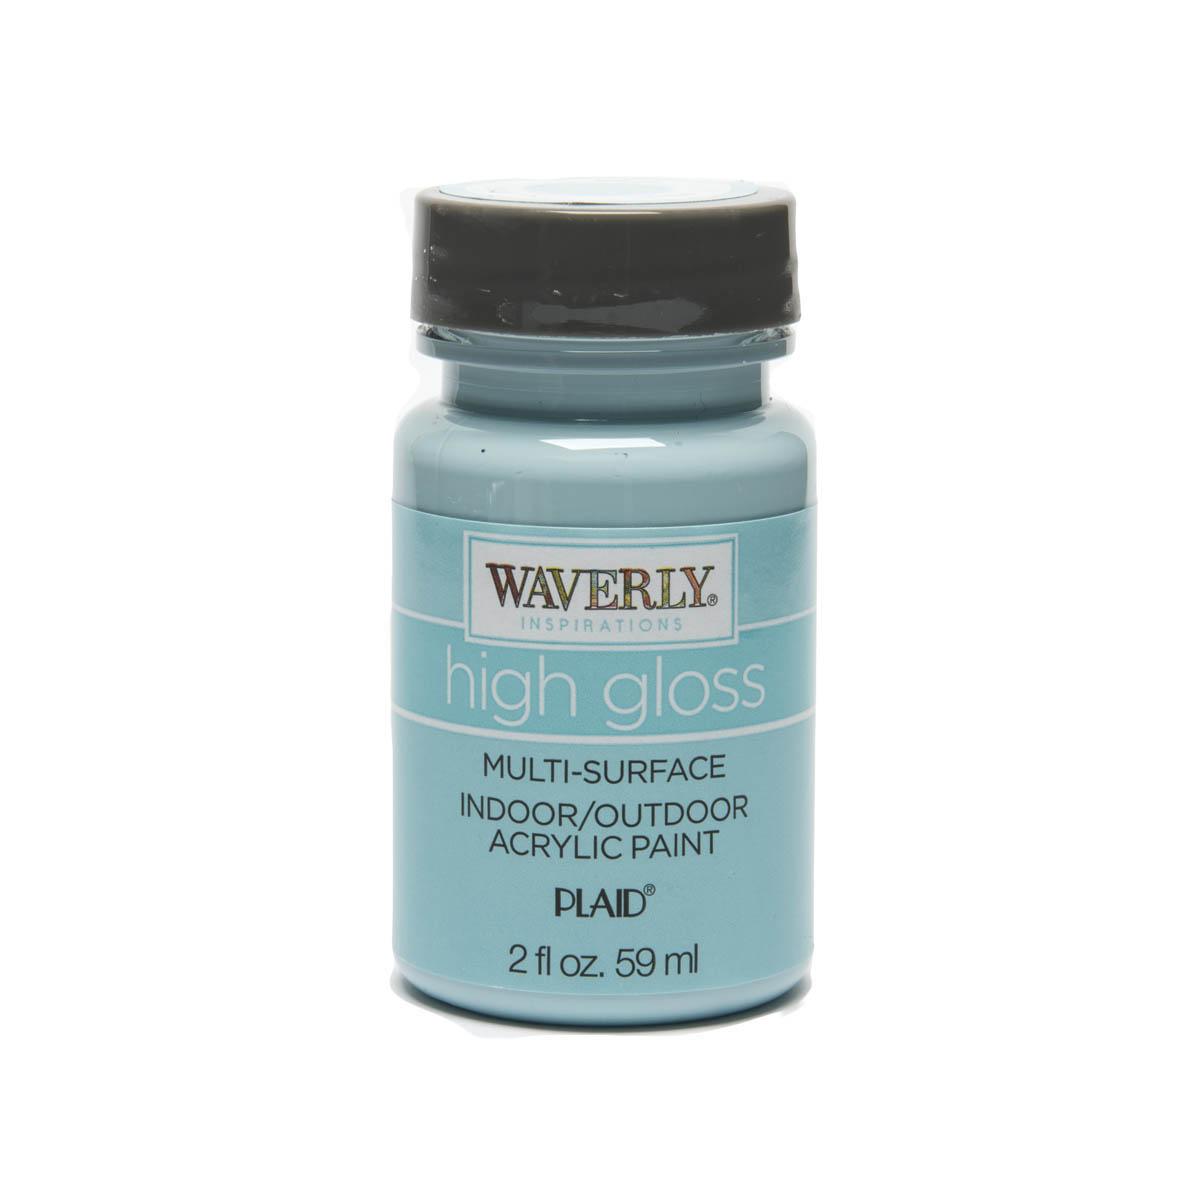 Waverly ® Inspirations High Gloss Multi-Surface Acrylic Paint - Pool, 2 oz. - 60934E